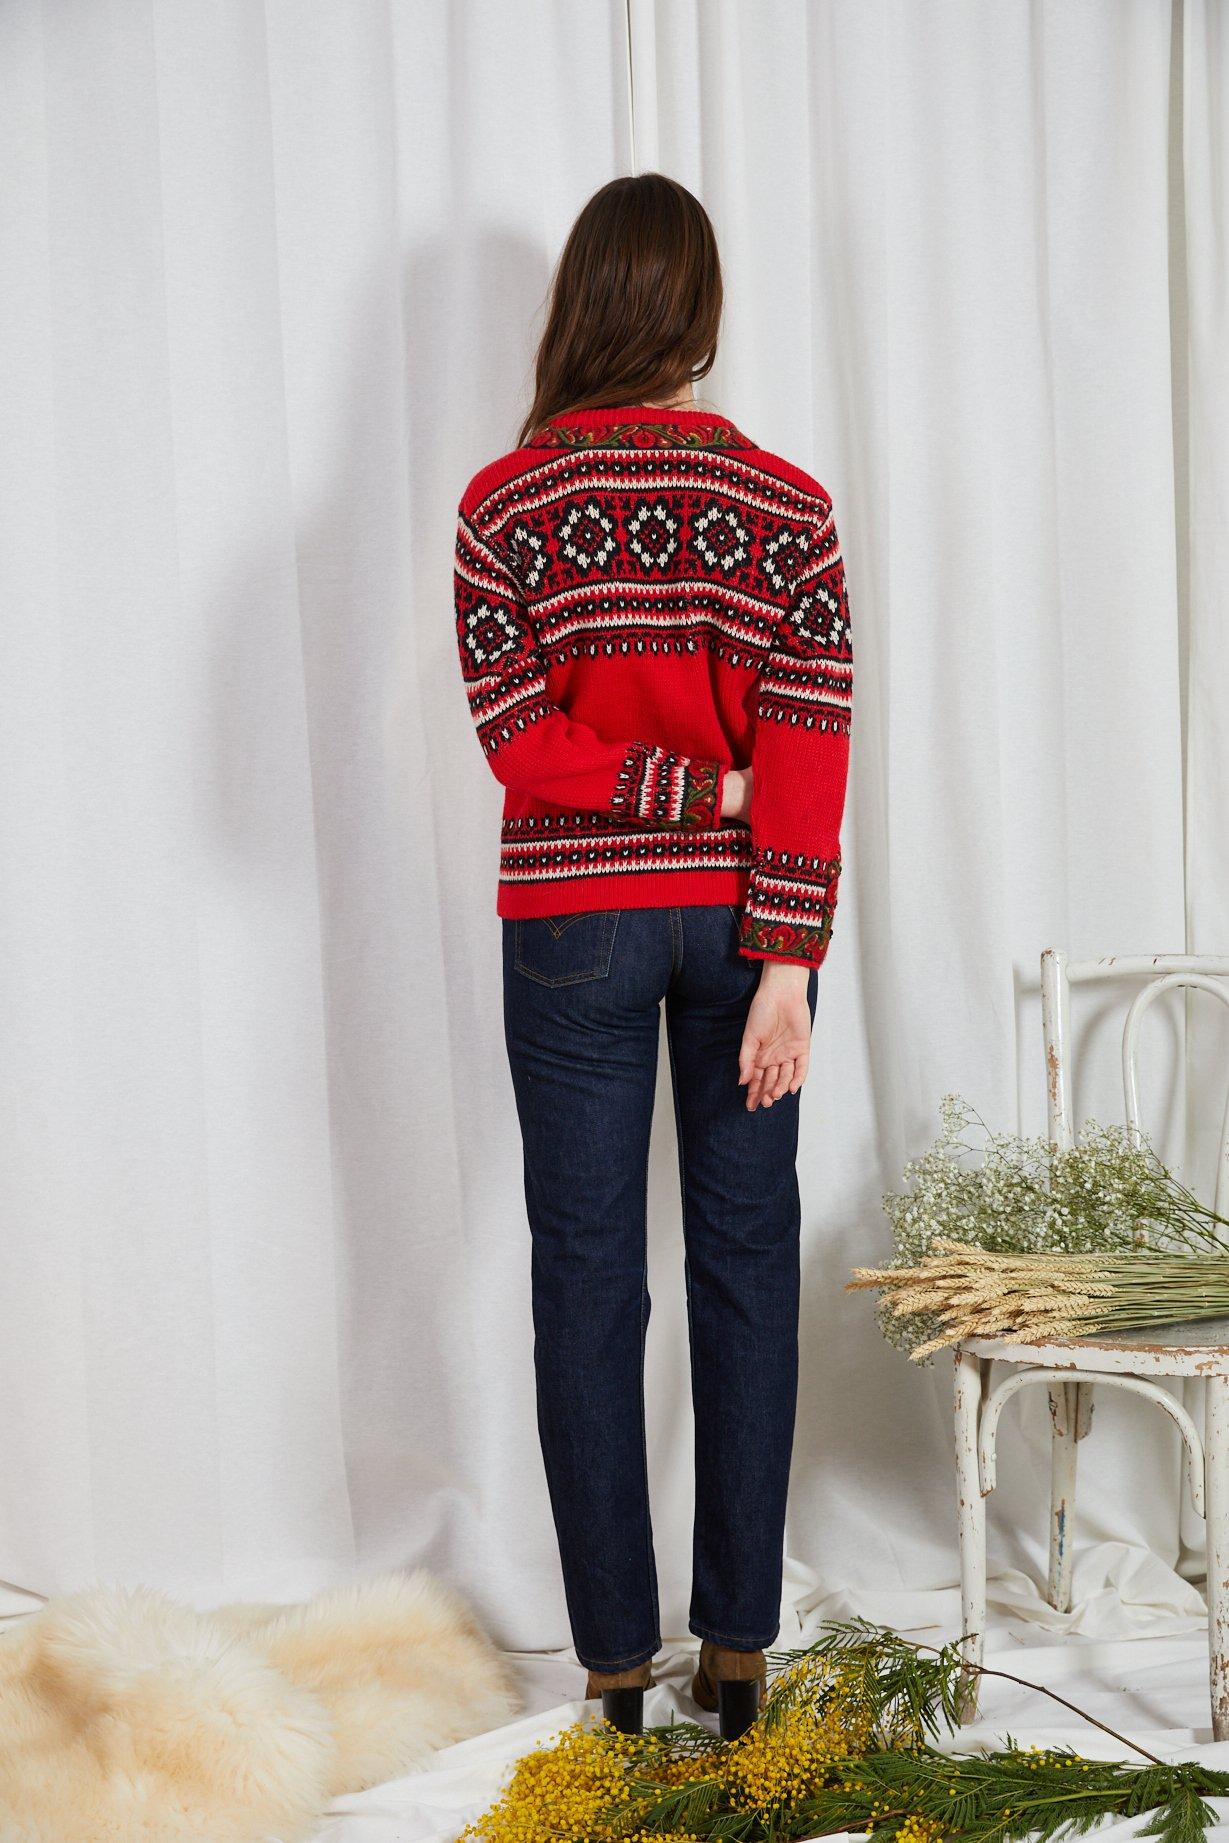 Pantalons - Jeans Levi's 501 W28L32